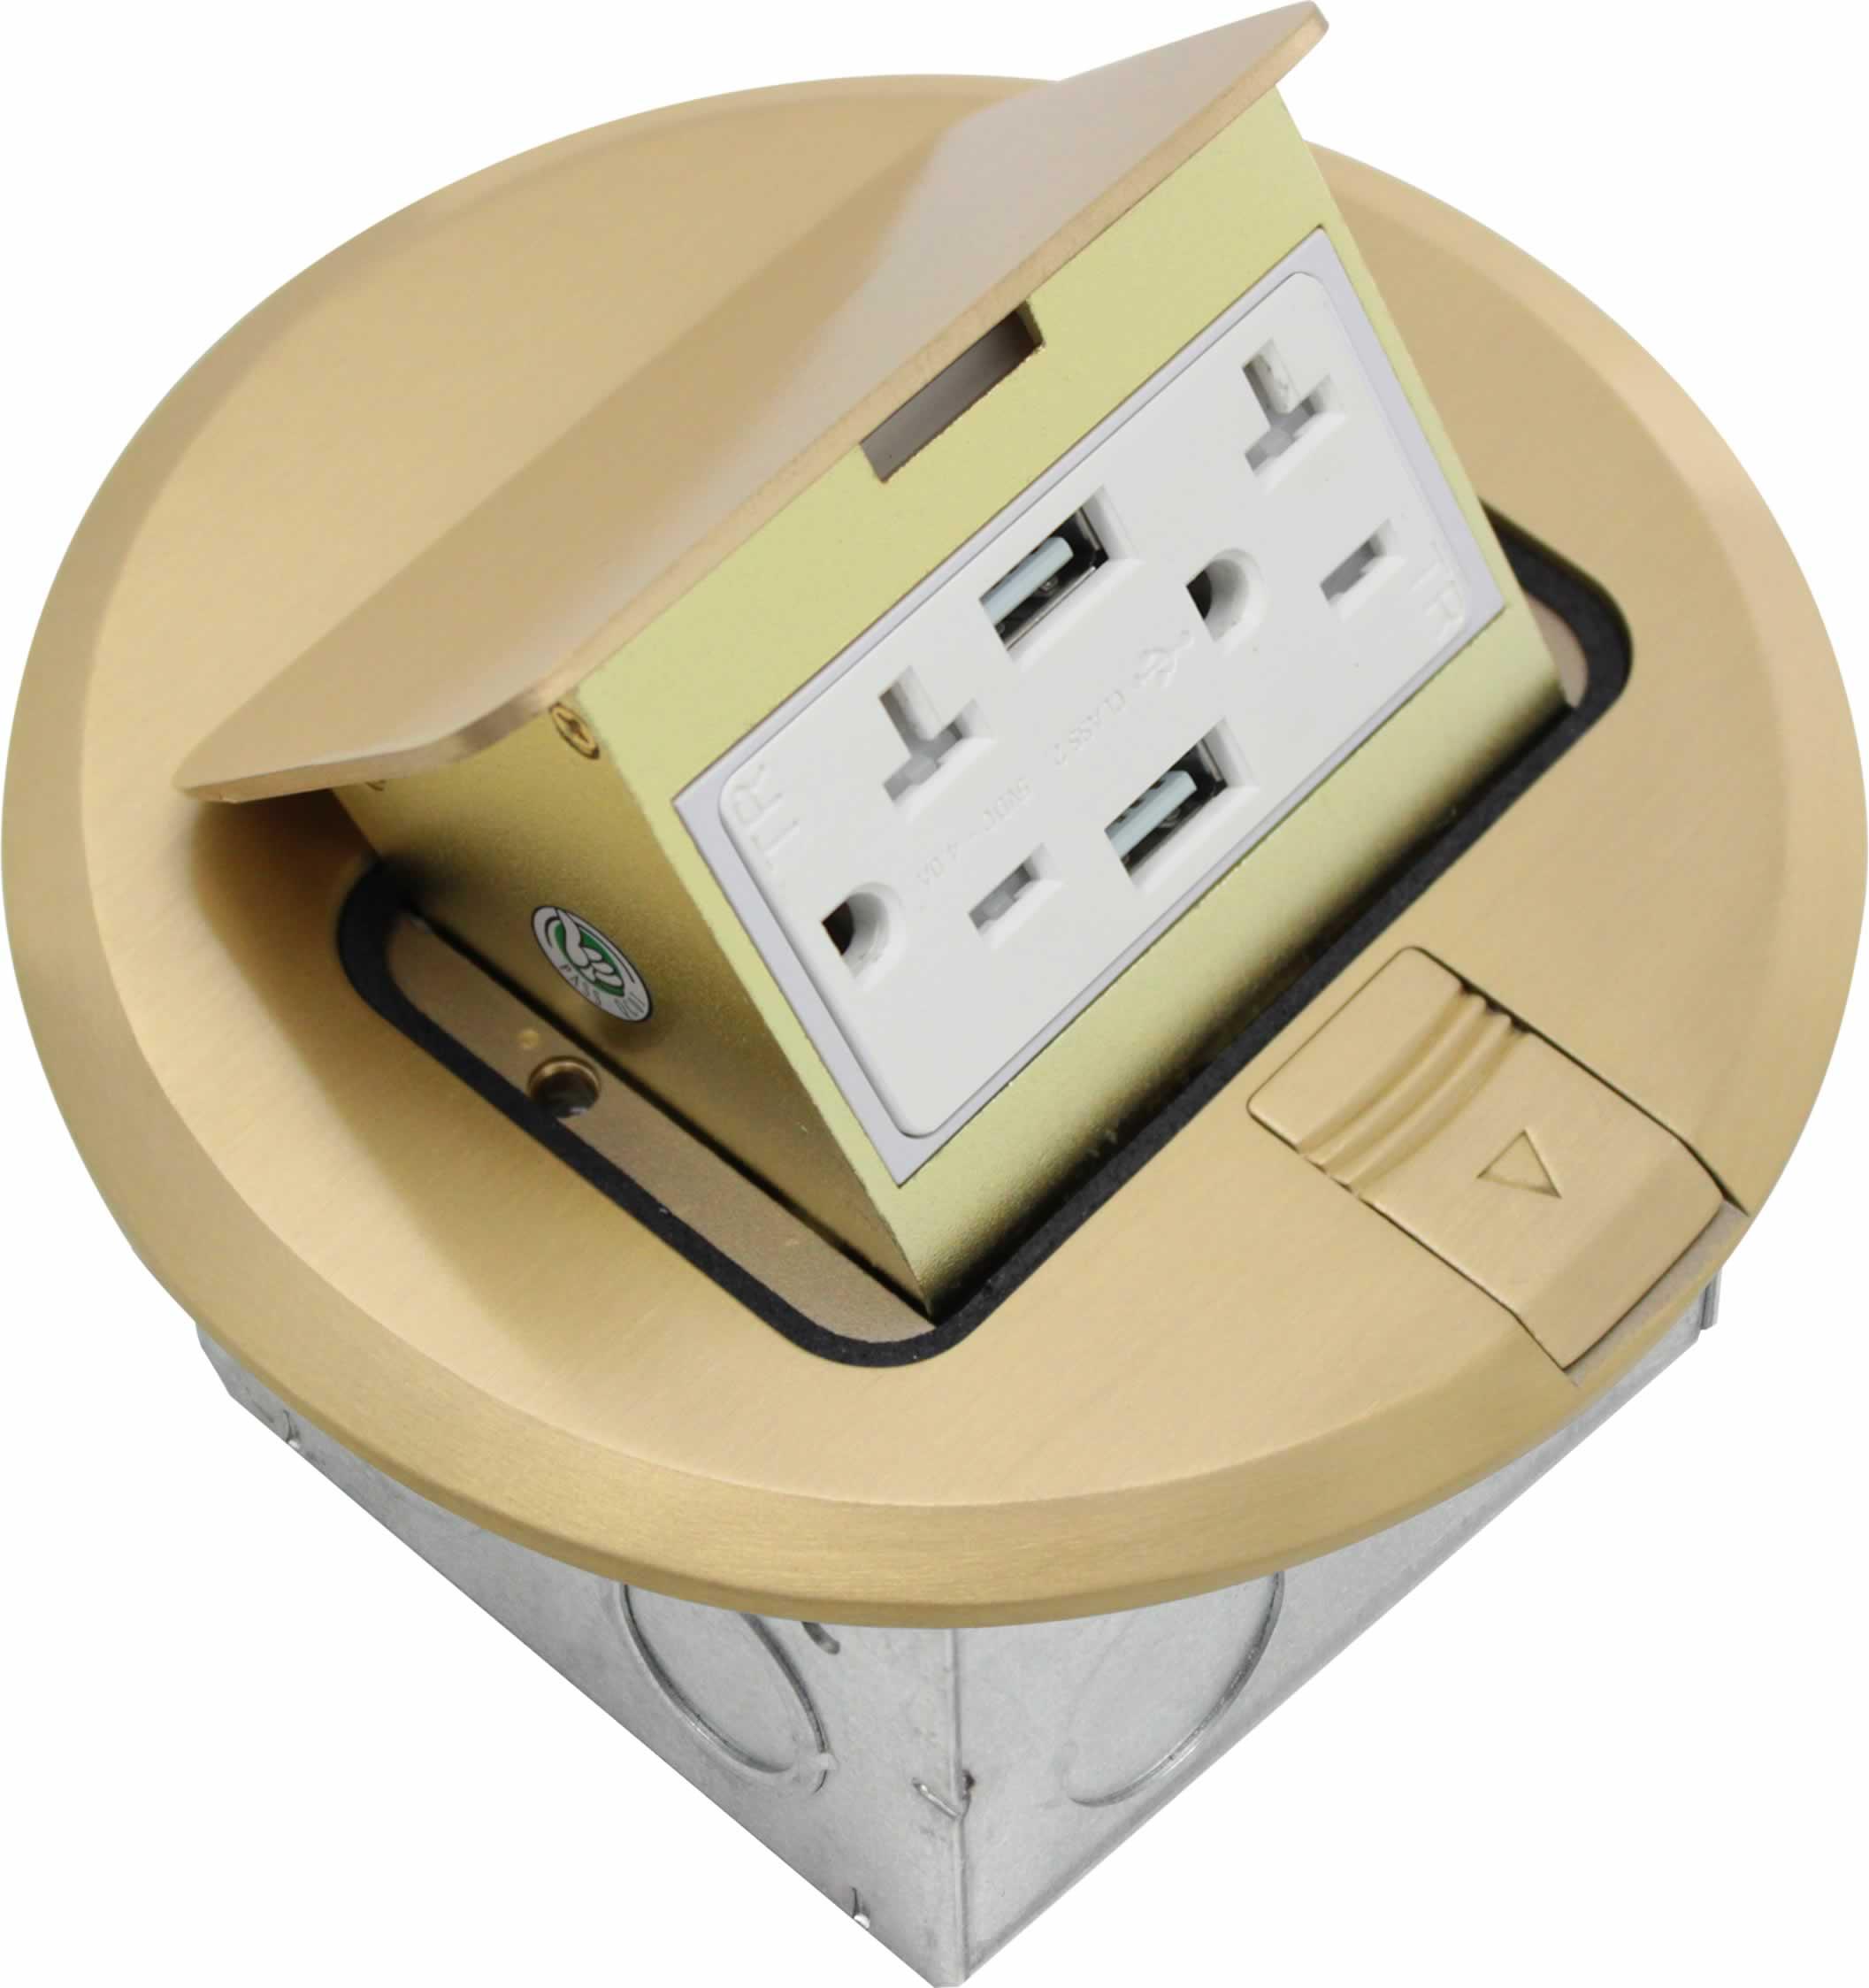 USB Floor Box